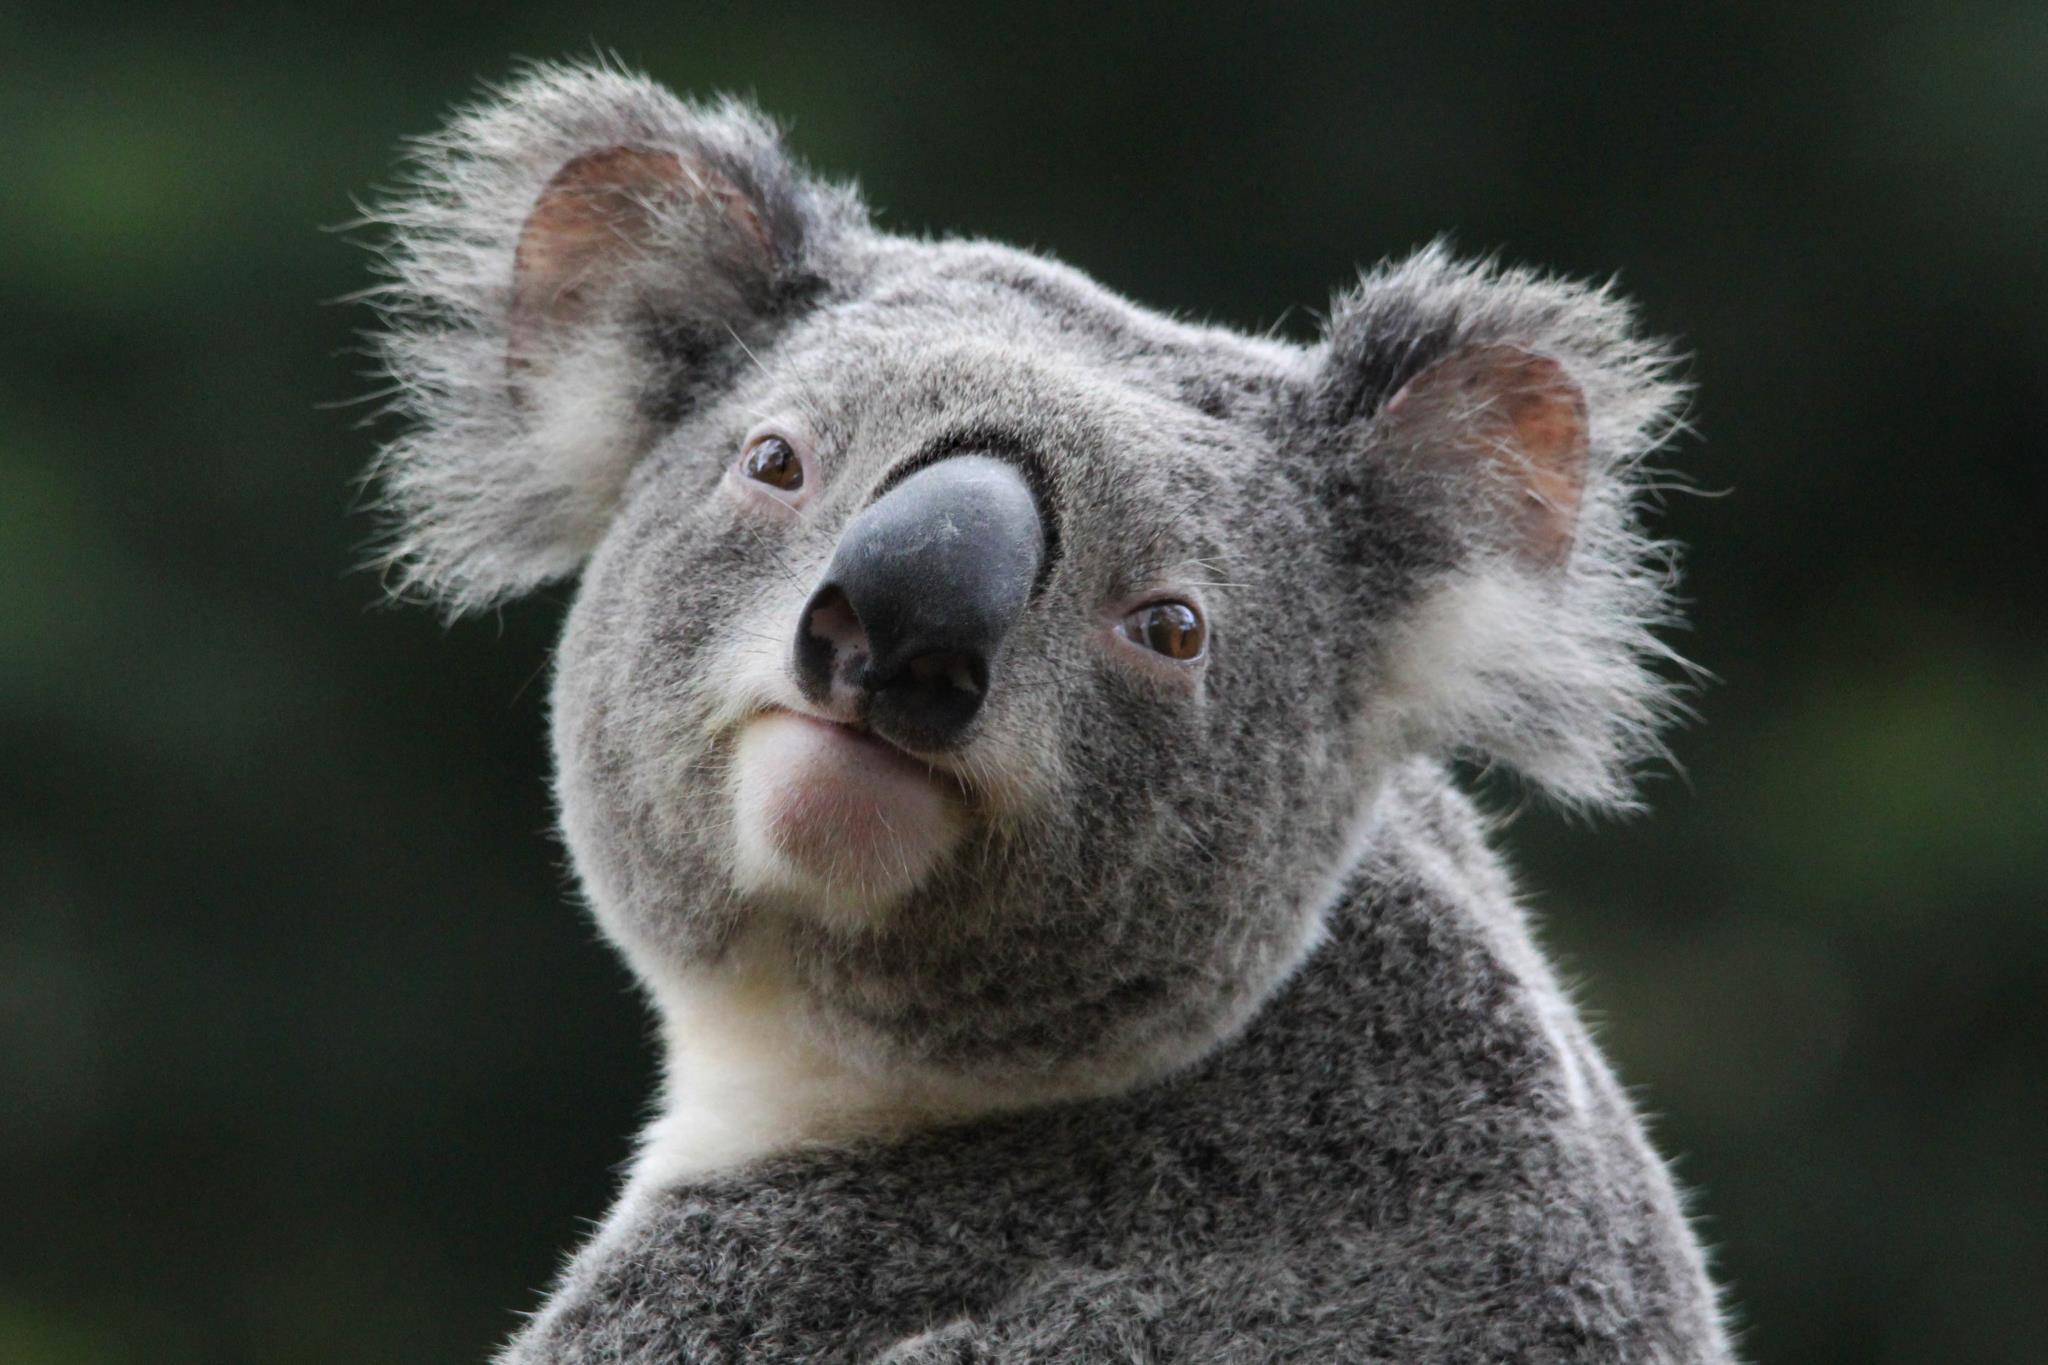 smiling koala picture - HD2048×1365